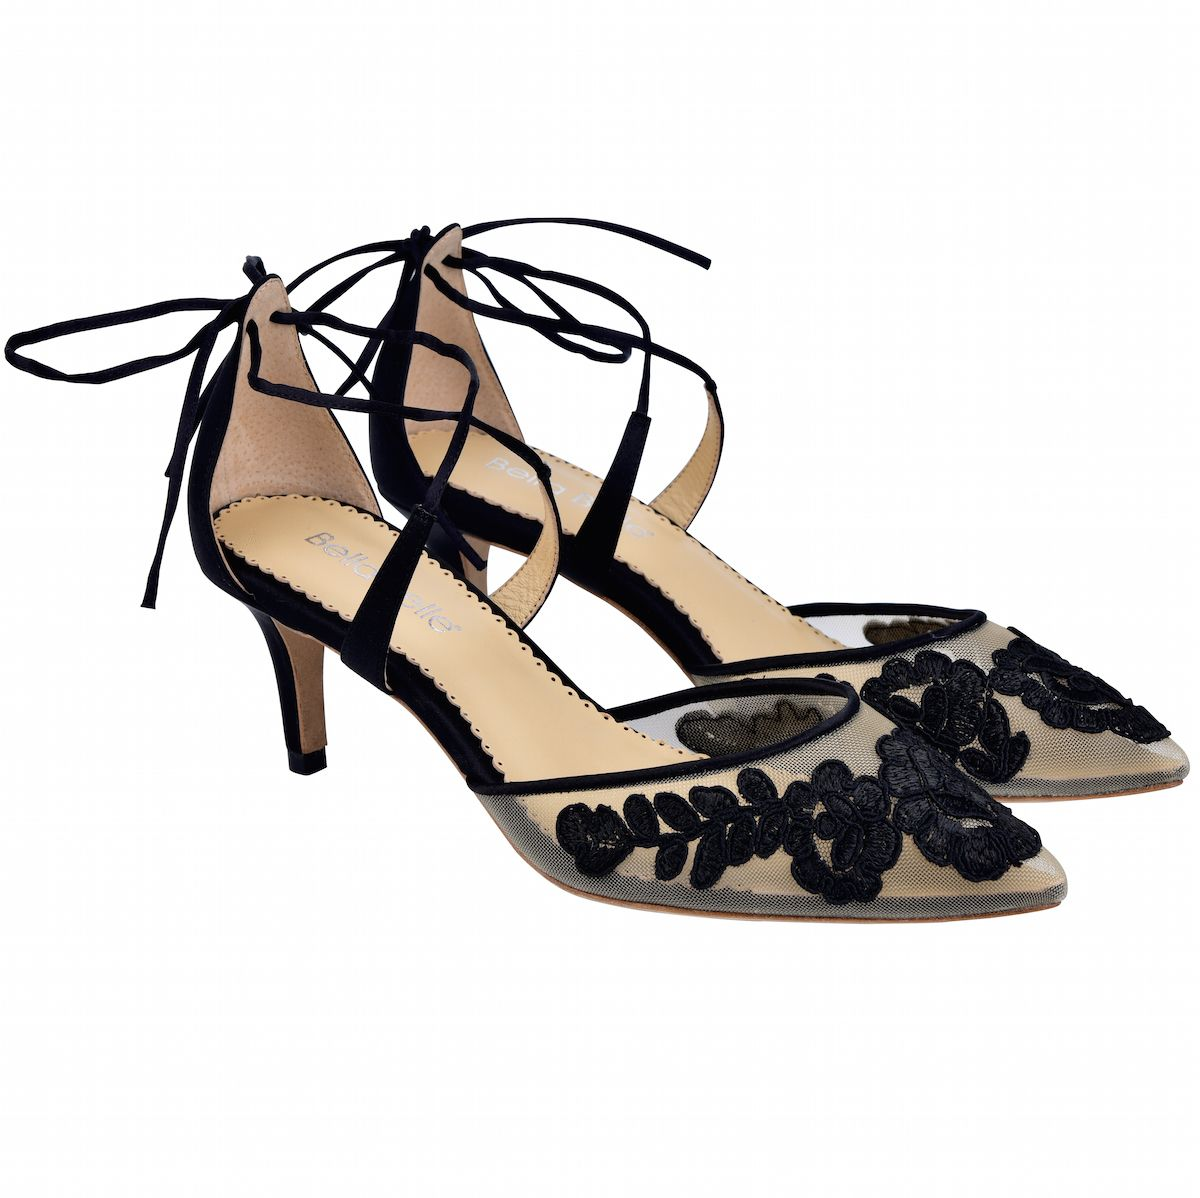 Black Lace Dress Shoes Low Heels Gold Wedding Shoes Black Lace Dress Shoes Heels [ 1198 x 1200 Pixel ]